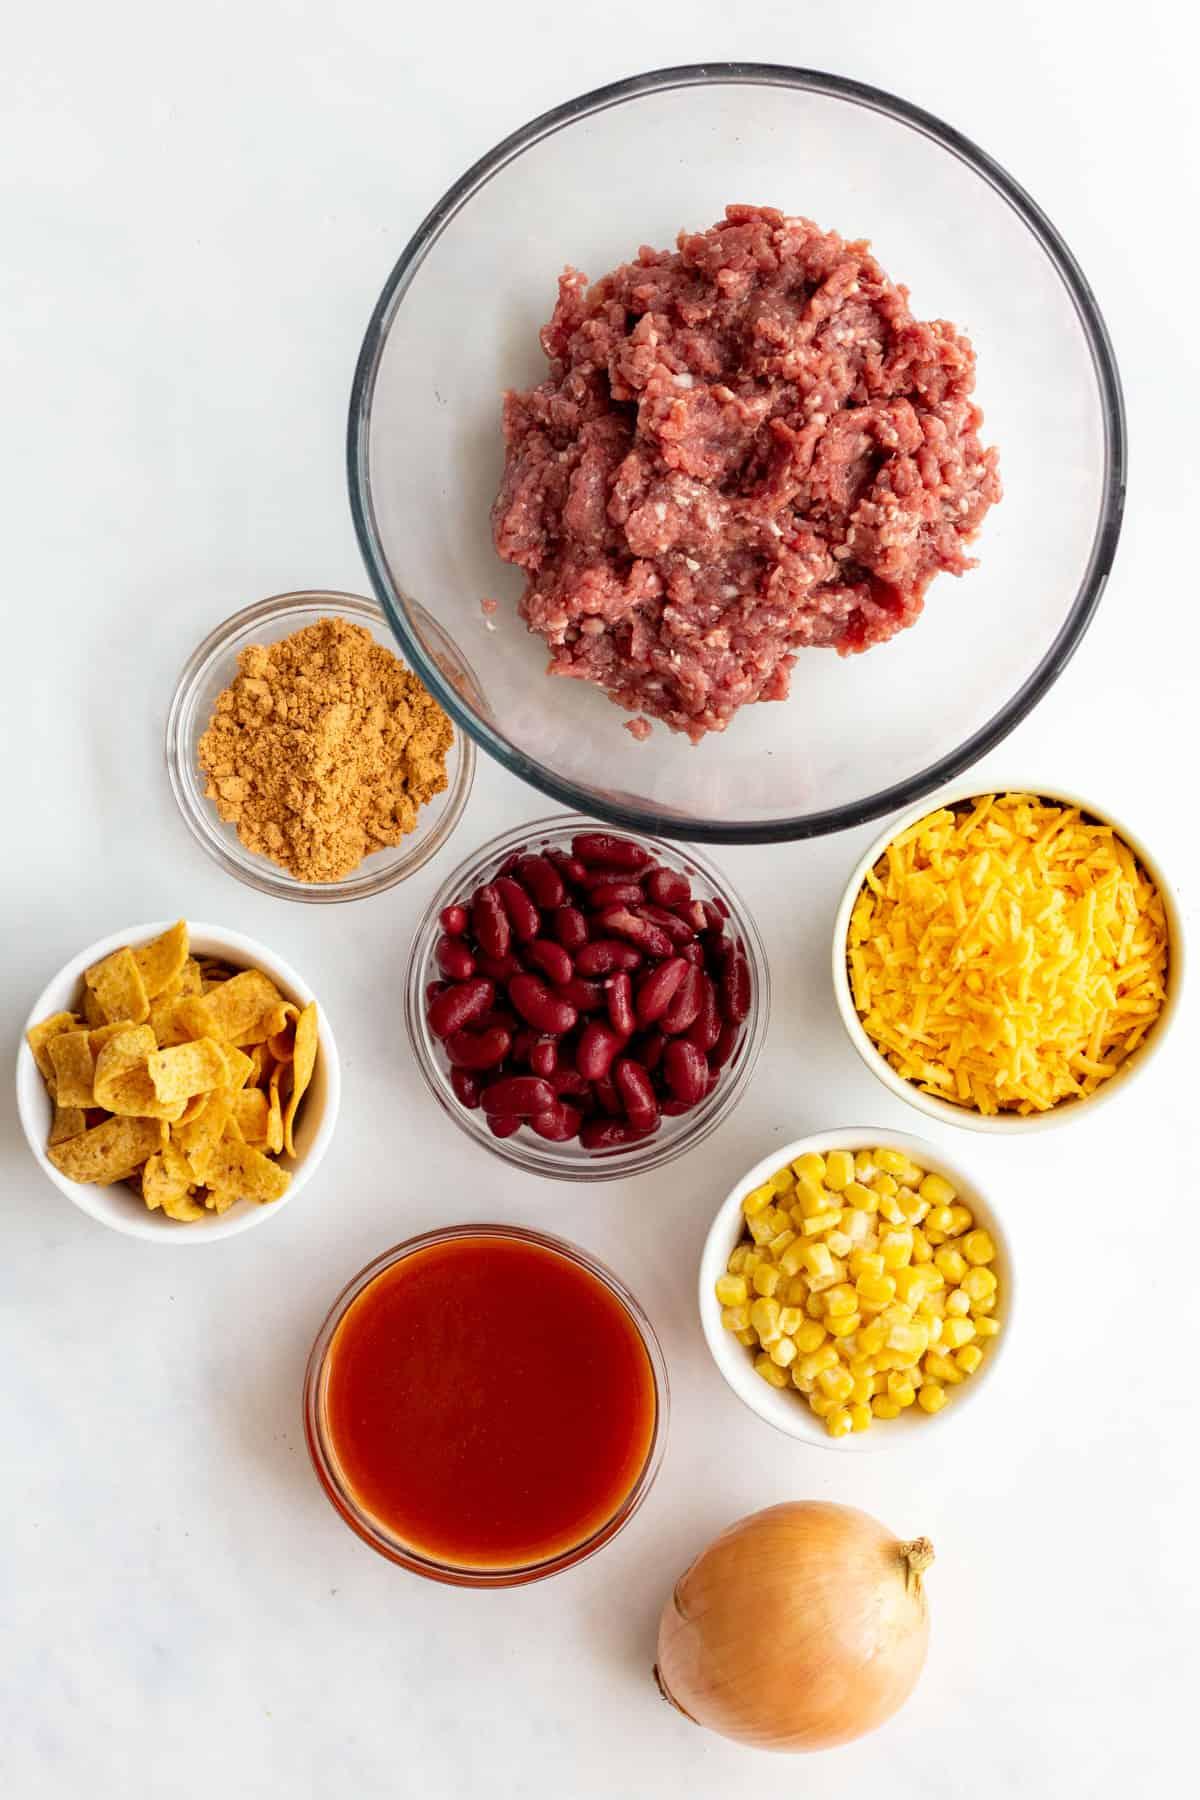 ingredients to make frito pie